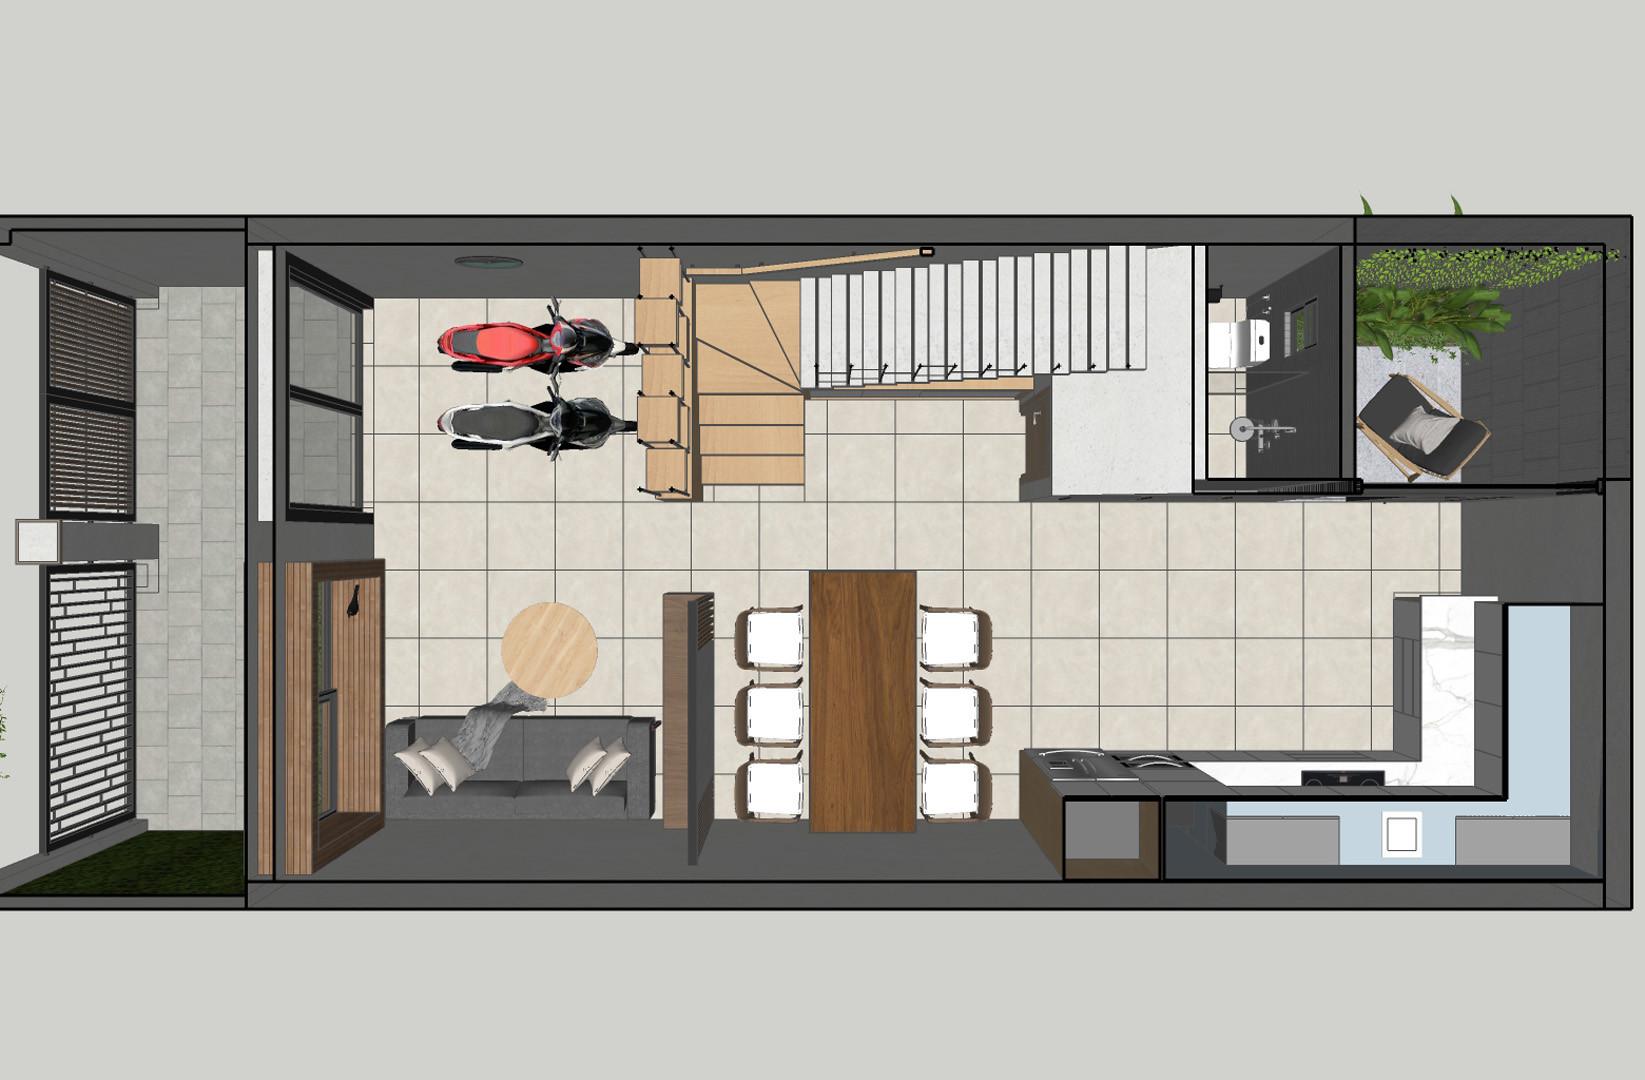 lnd_mrsvanhouse (3).jpg